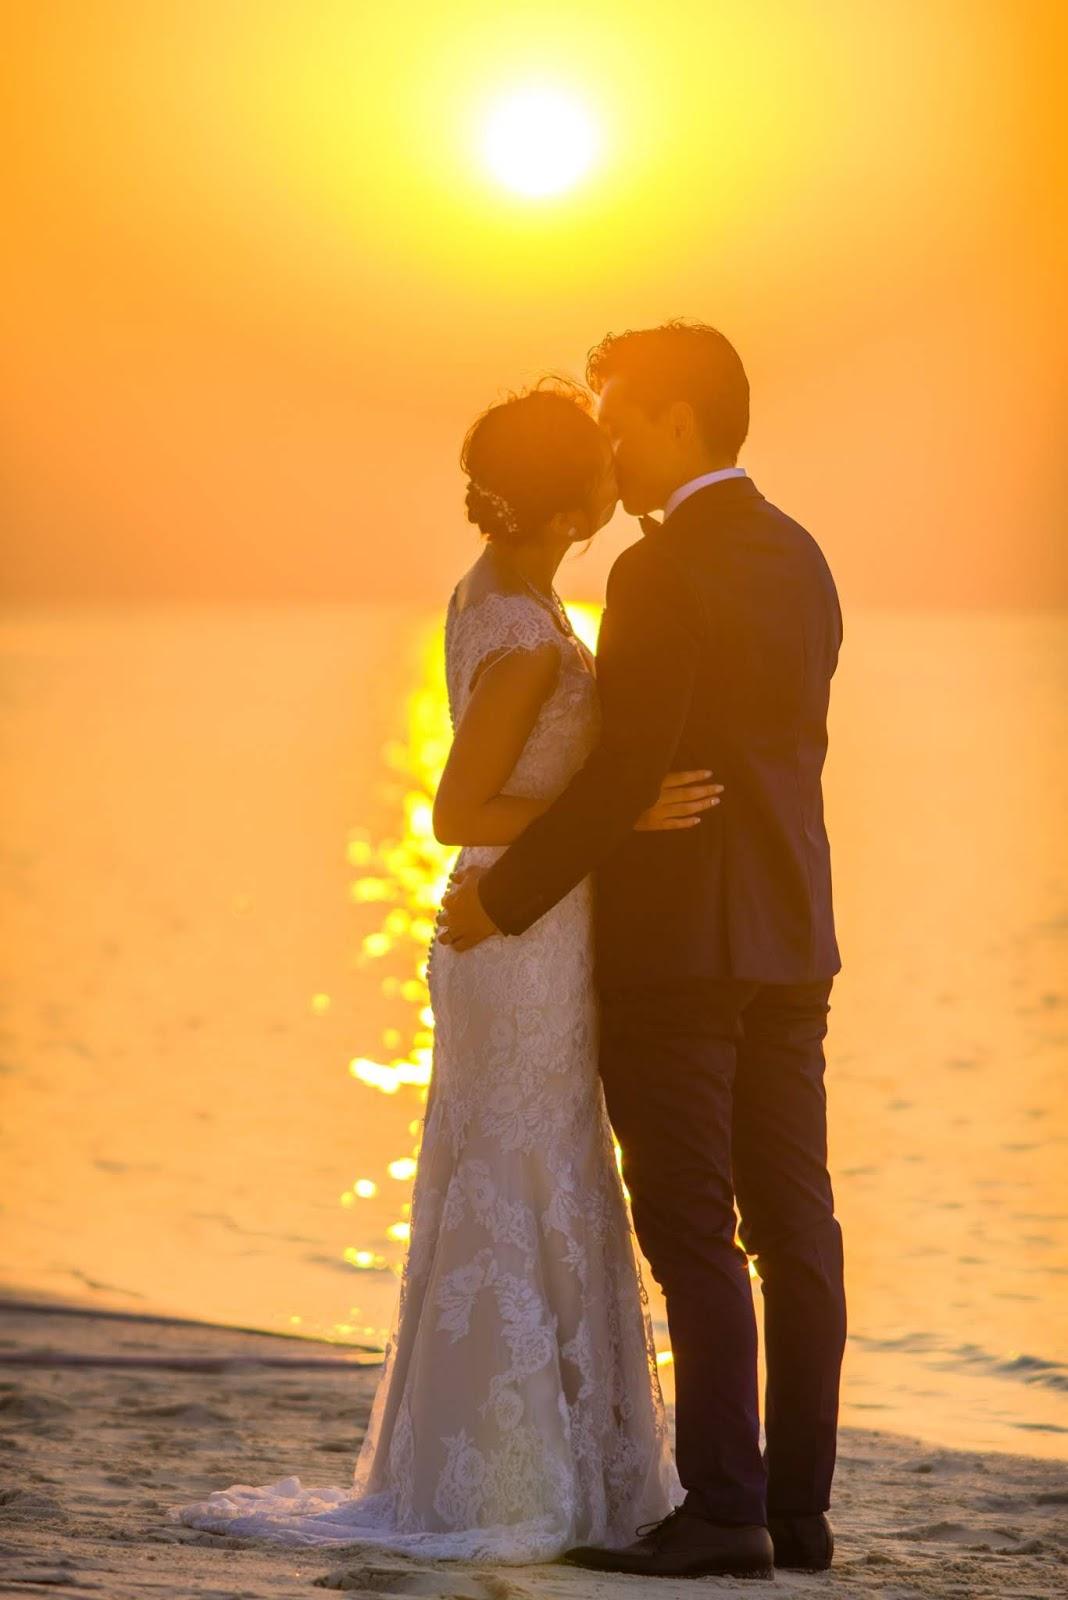 romantic love shayari and best romantic quotes 2019 in hindi